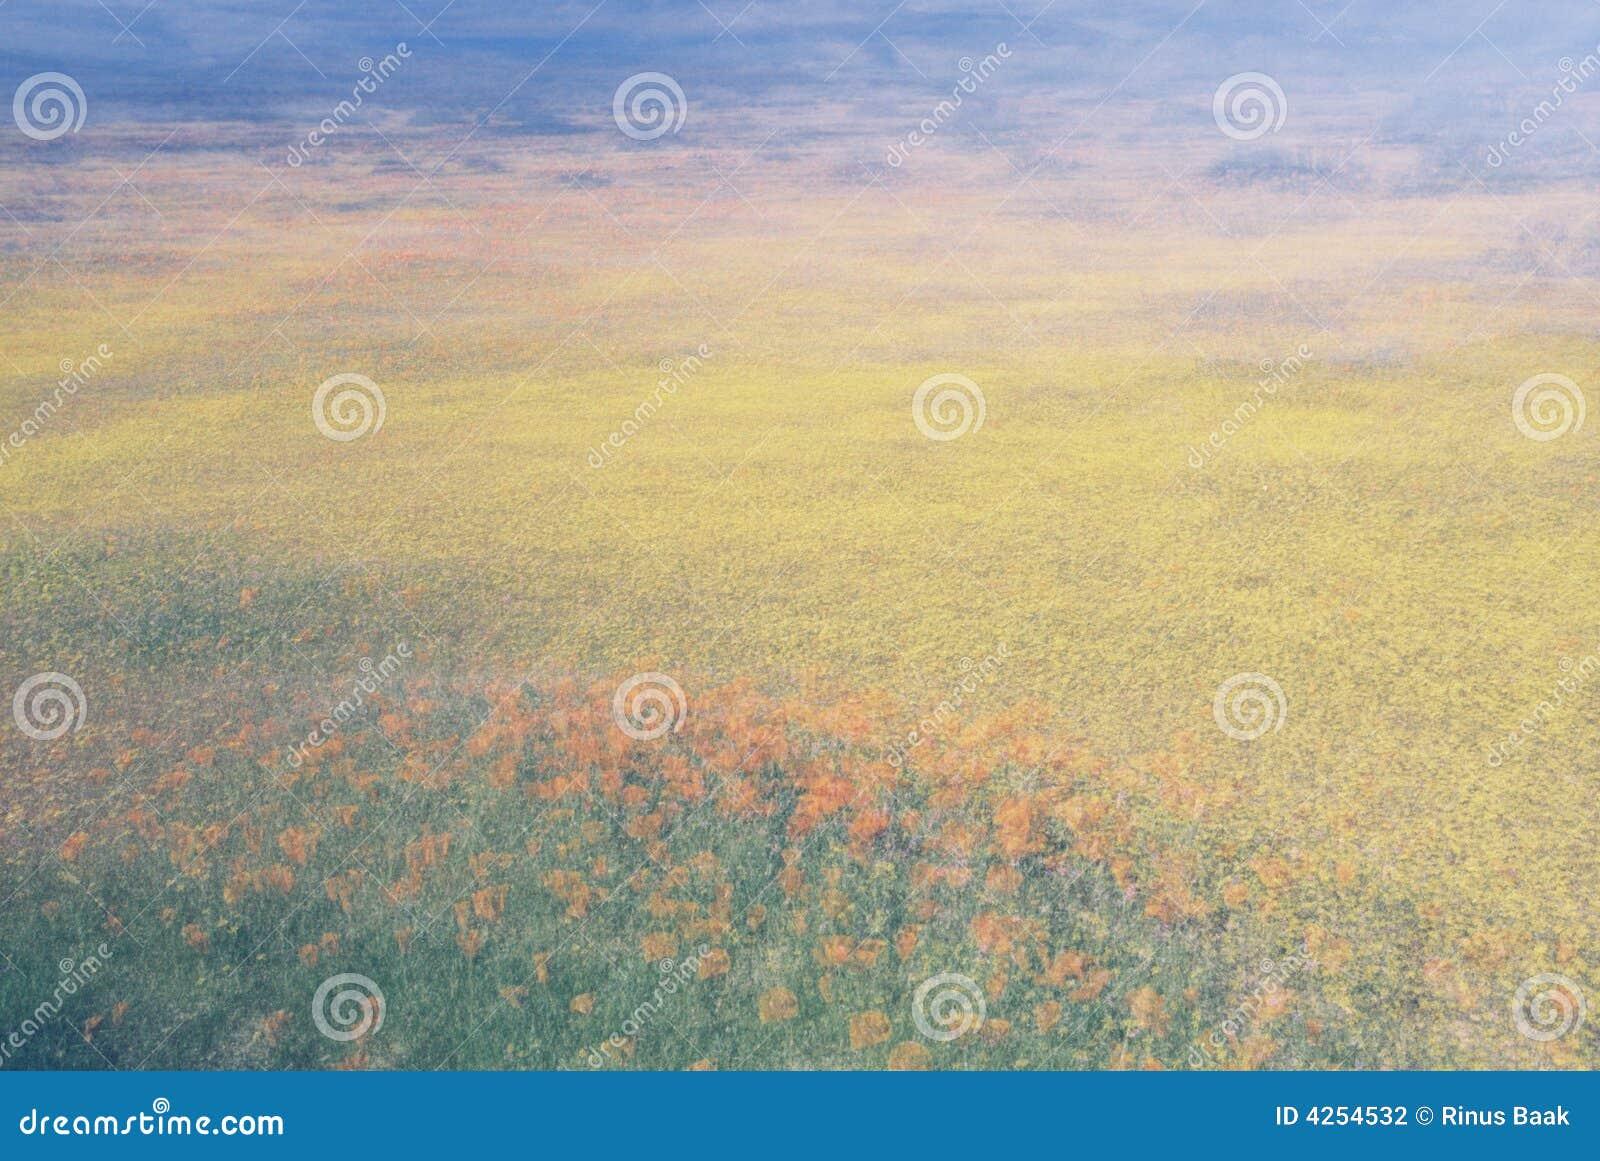 Abstrakt fältblomma